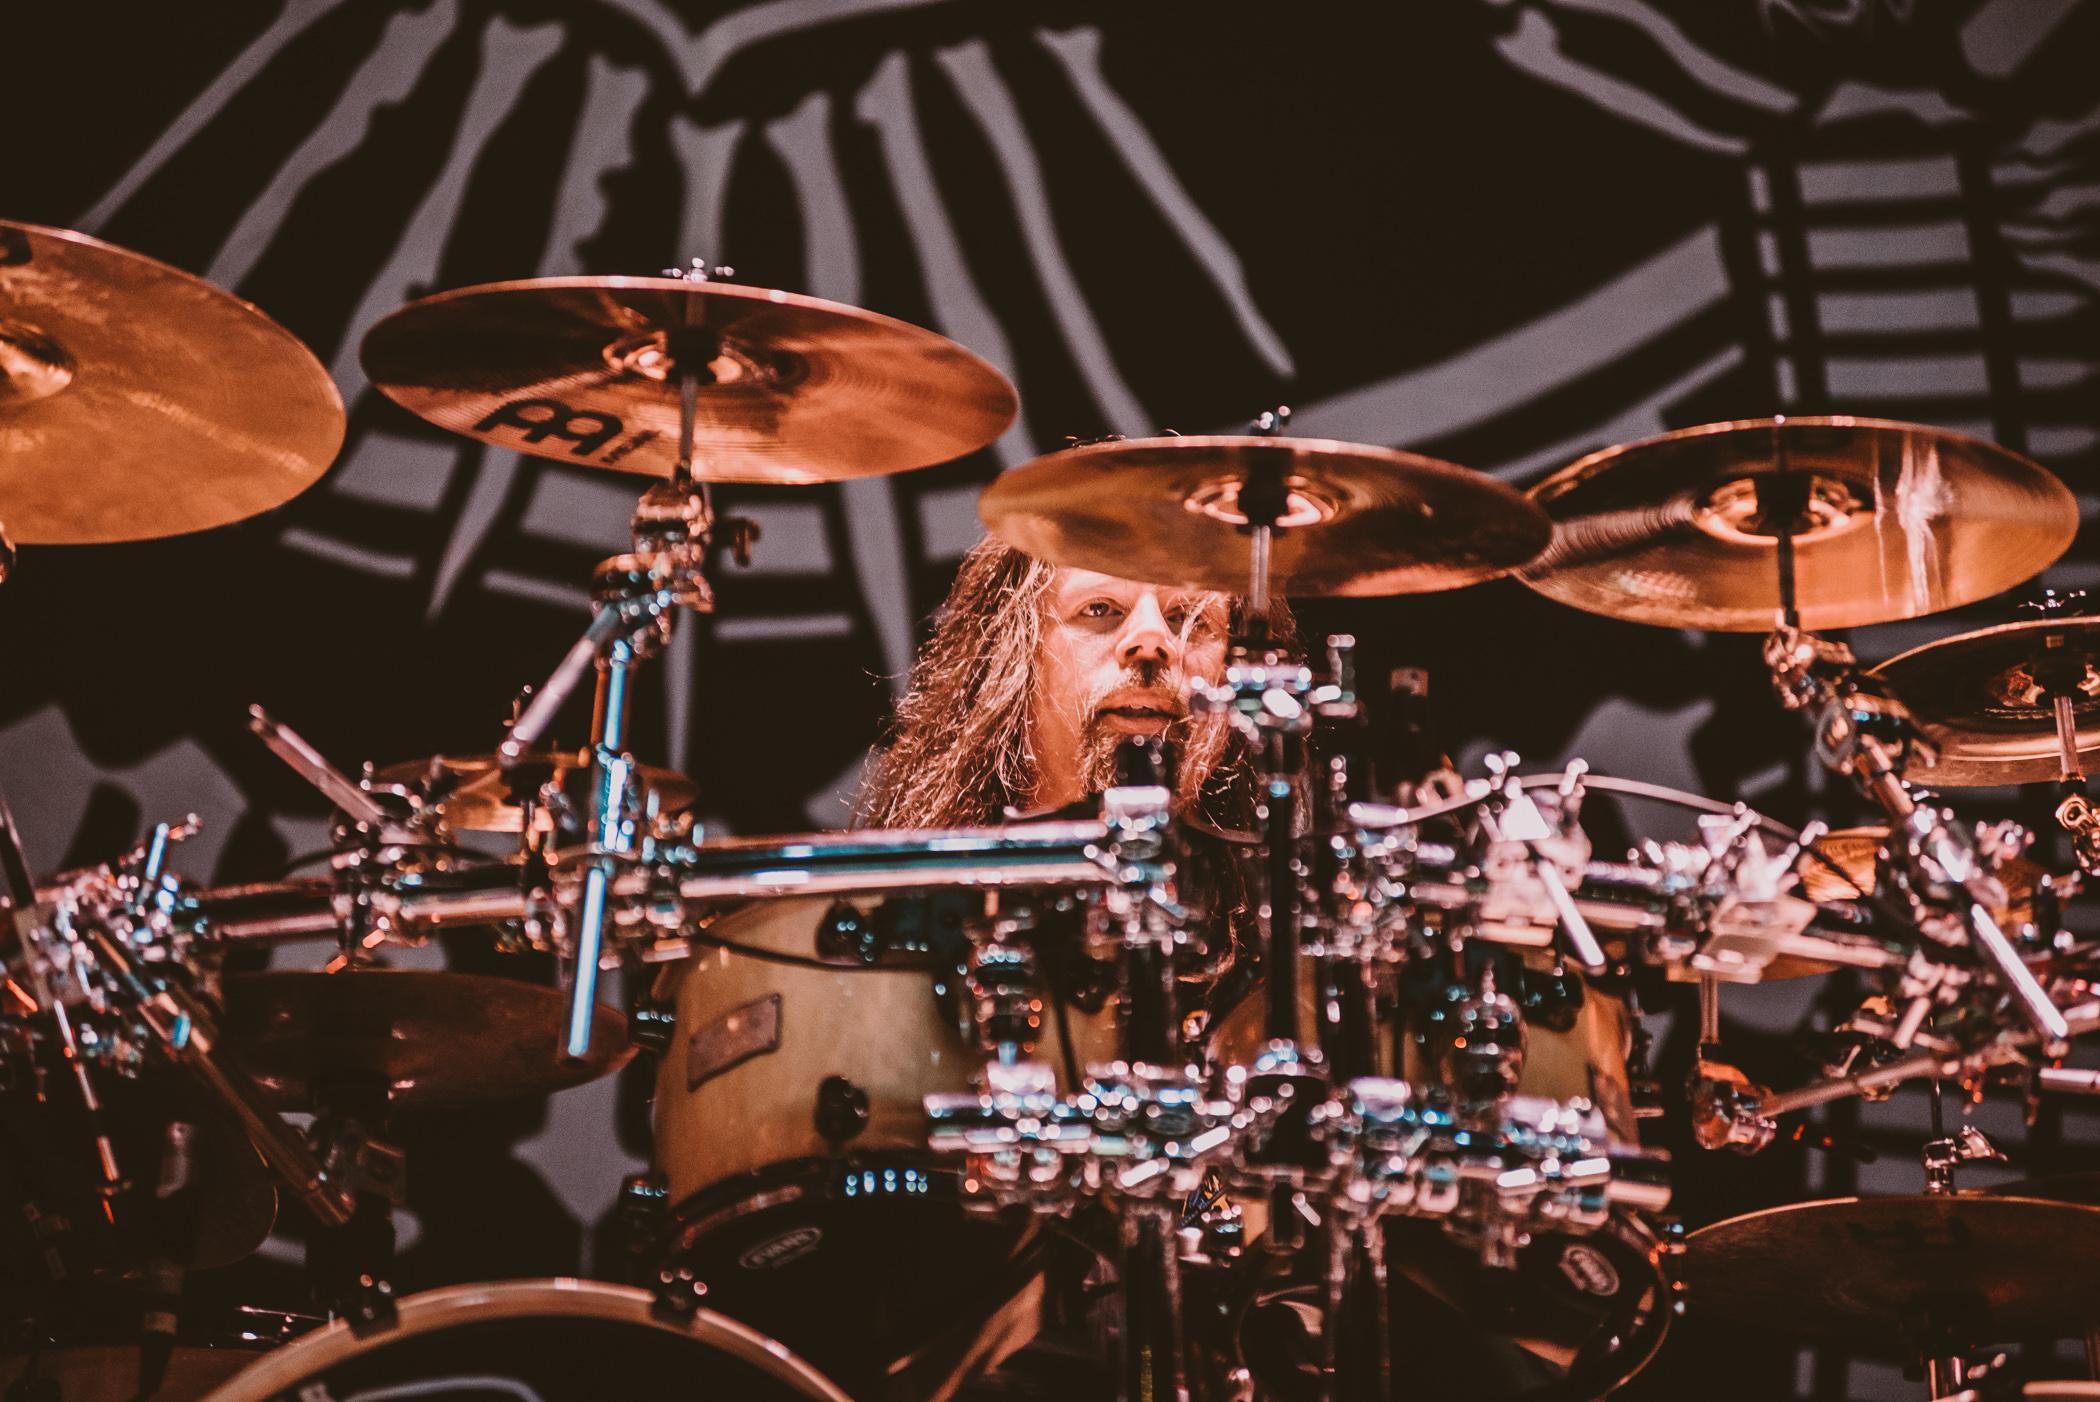 1_Lamb_Of_God-Pacific_Coliseum-Vancouver-Timothy_Nguyen-20180516 (47 of 47).jpg